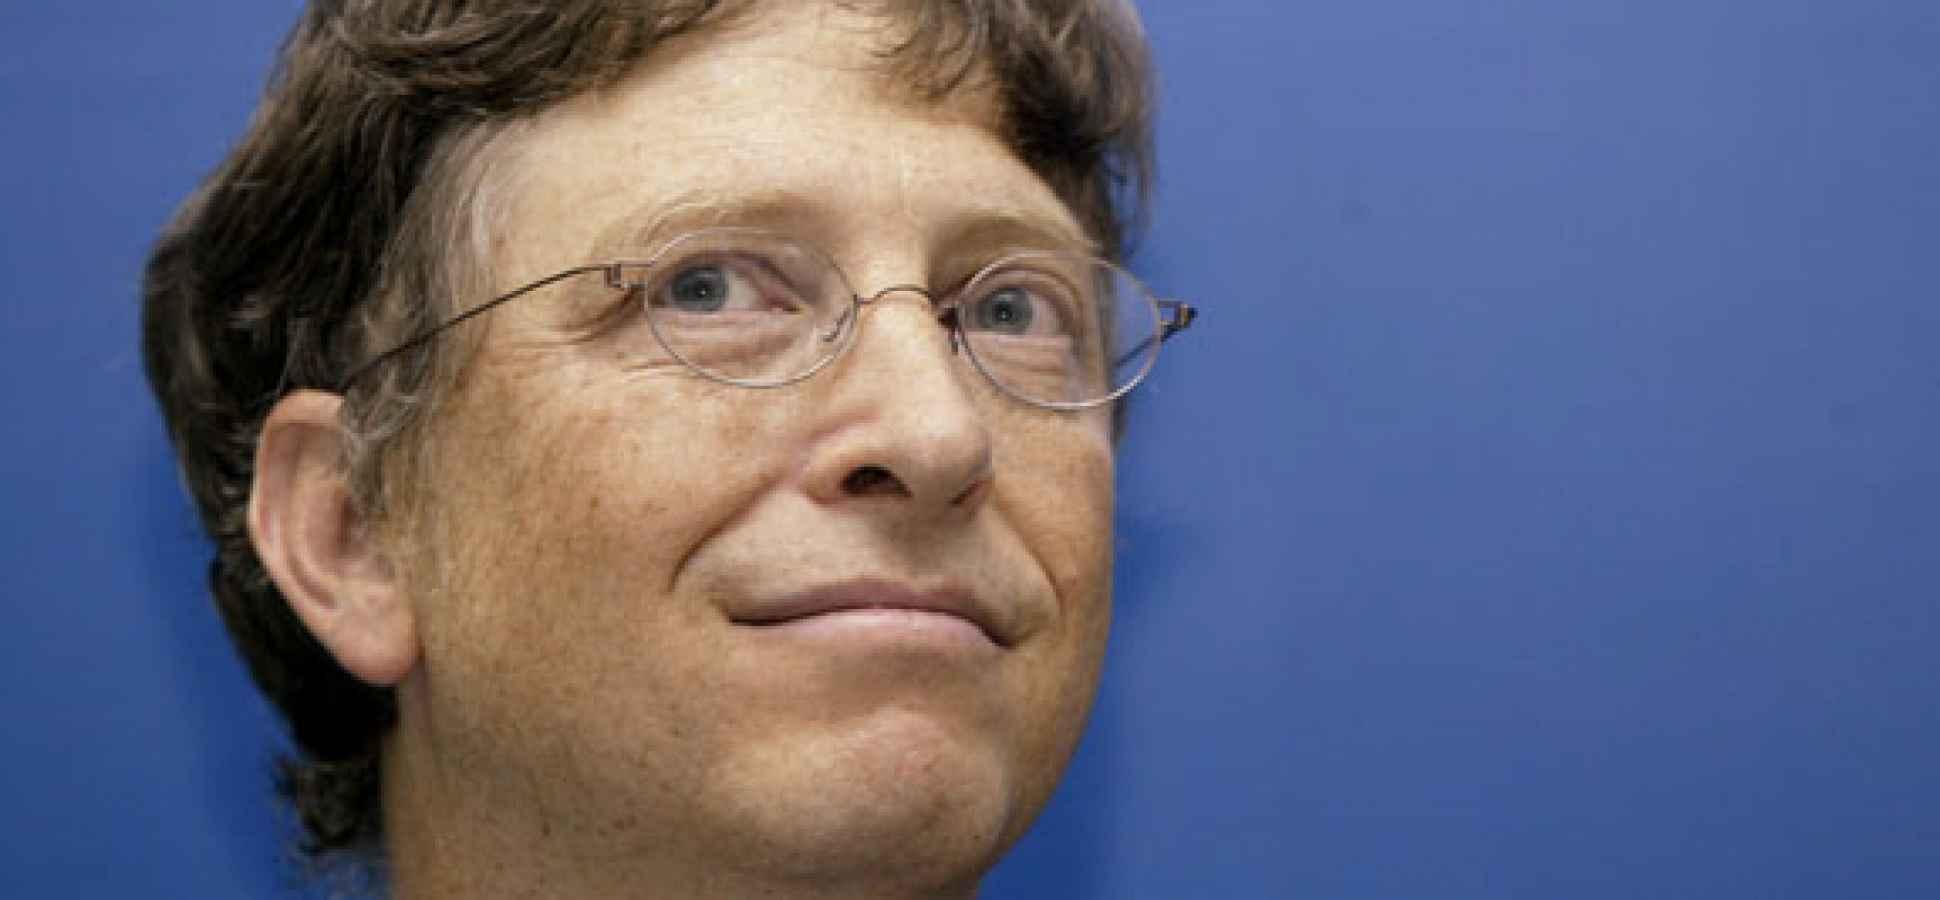 Bill Gates: Good Feedback Is the Key to Improvement